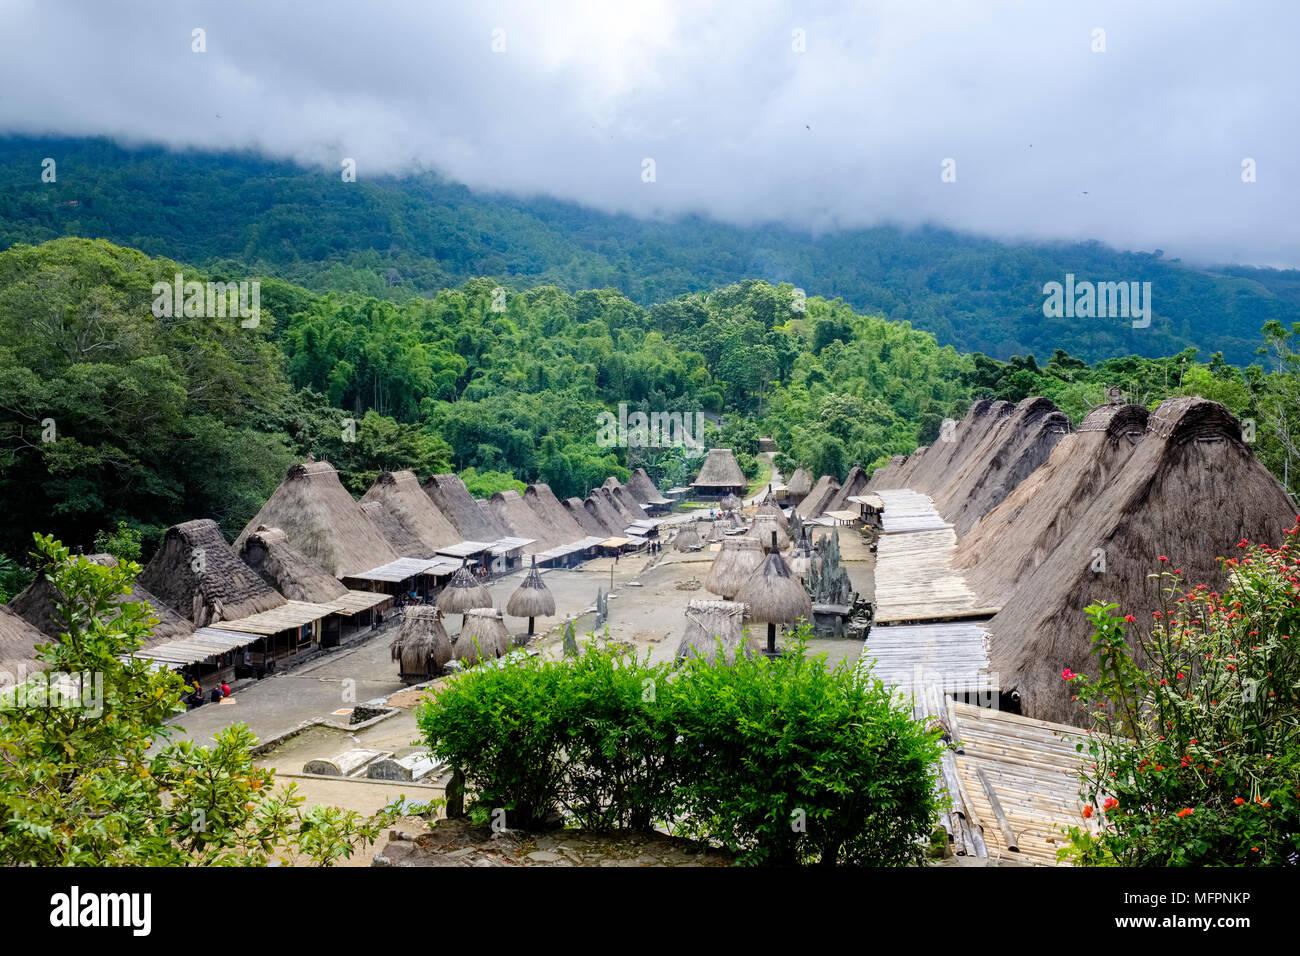 Establishing shot of Bena traditional village, Ngada District, Island of Flores (East Nusa Tenggara), Indonesia. - Stock Image